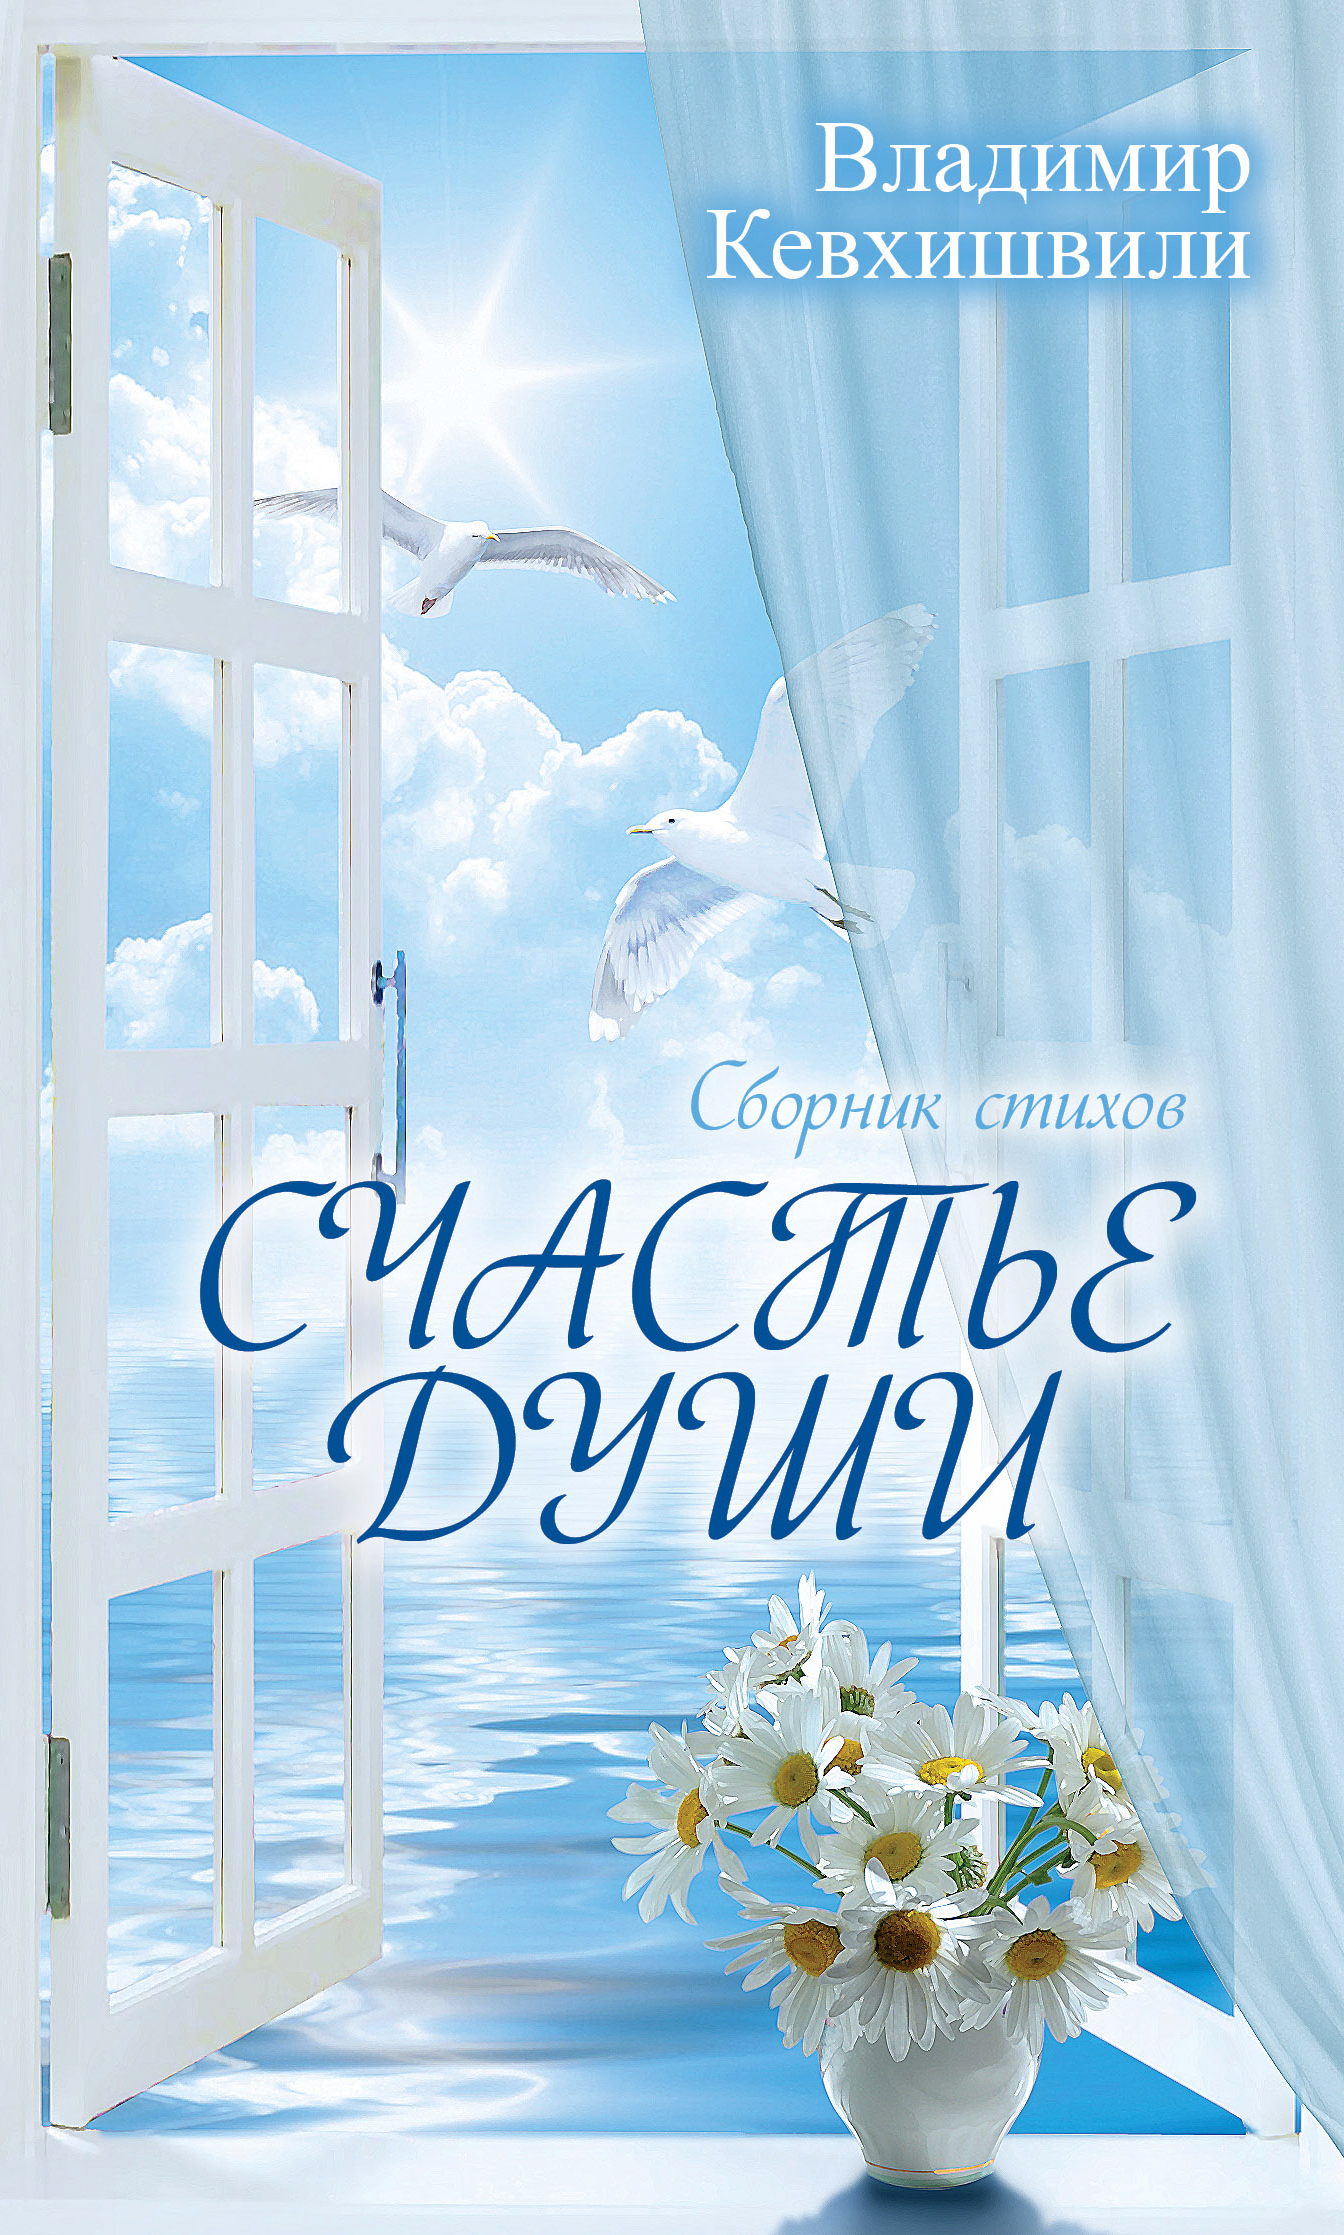 Владимир Кевхишвили Счастье души владимир кевхишвили счастье души